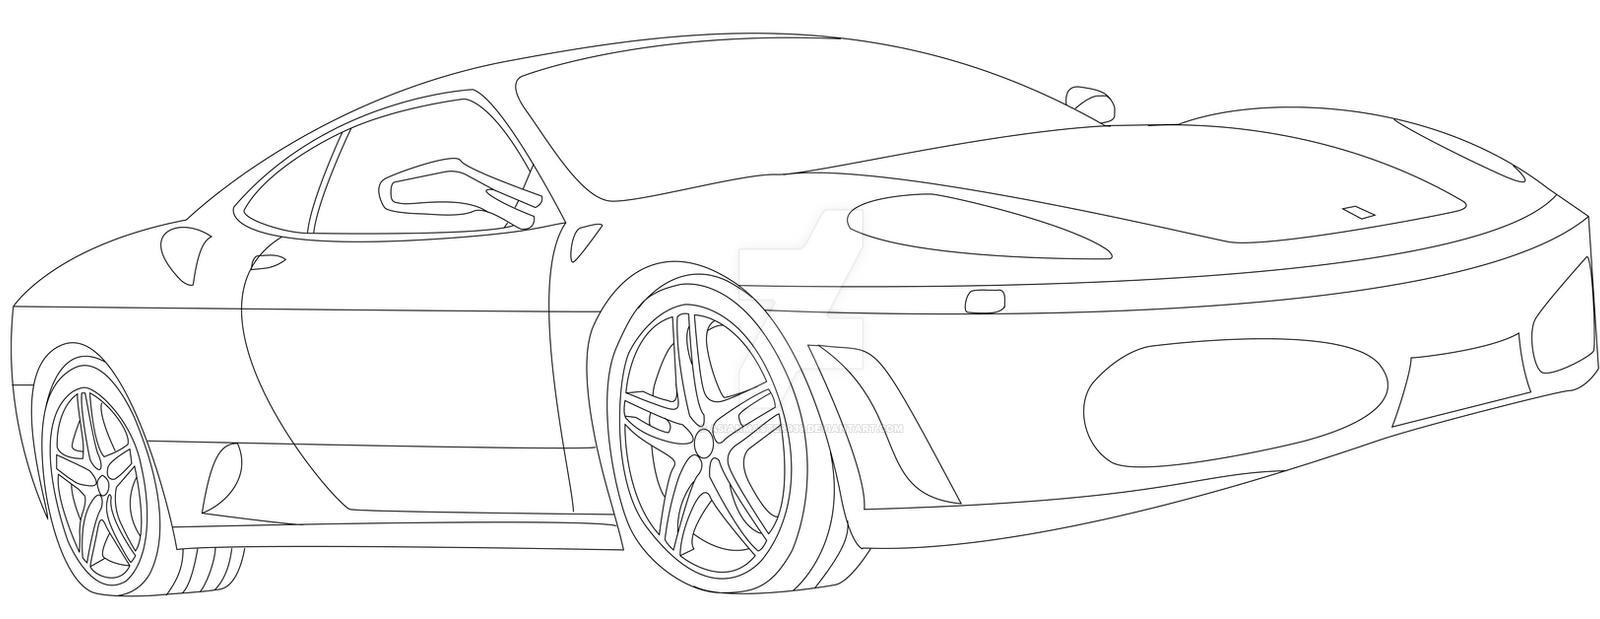 Ferrari F430 Lineart